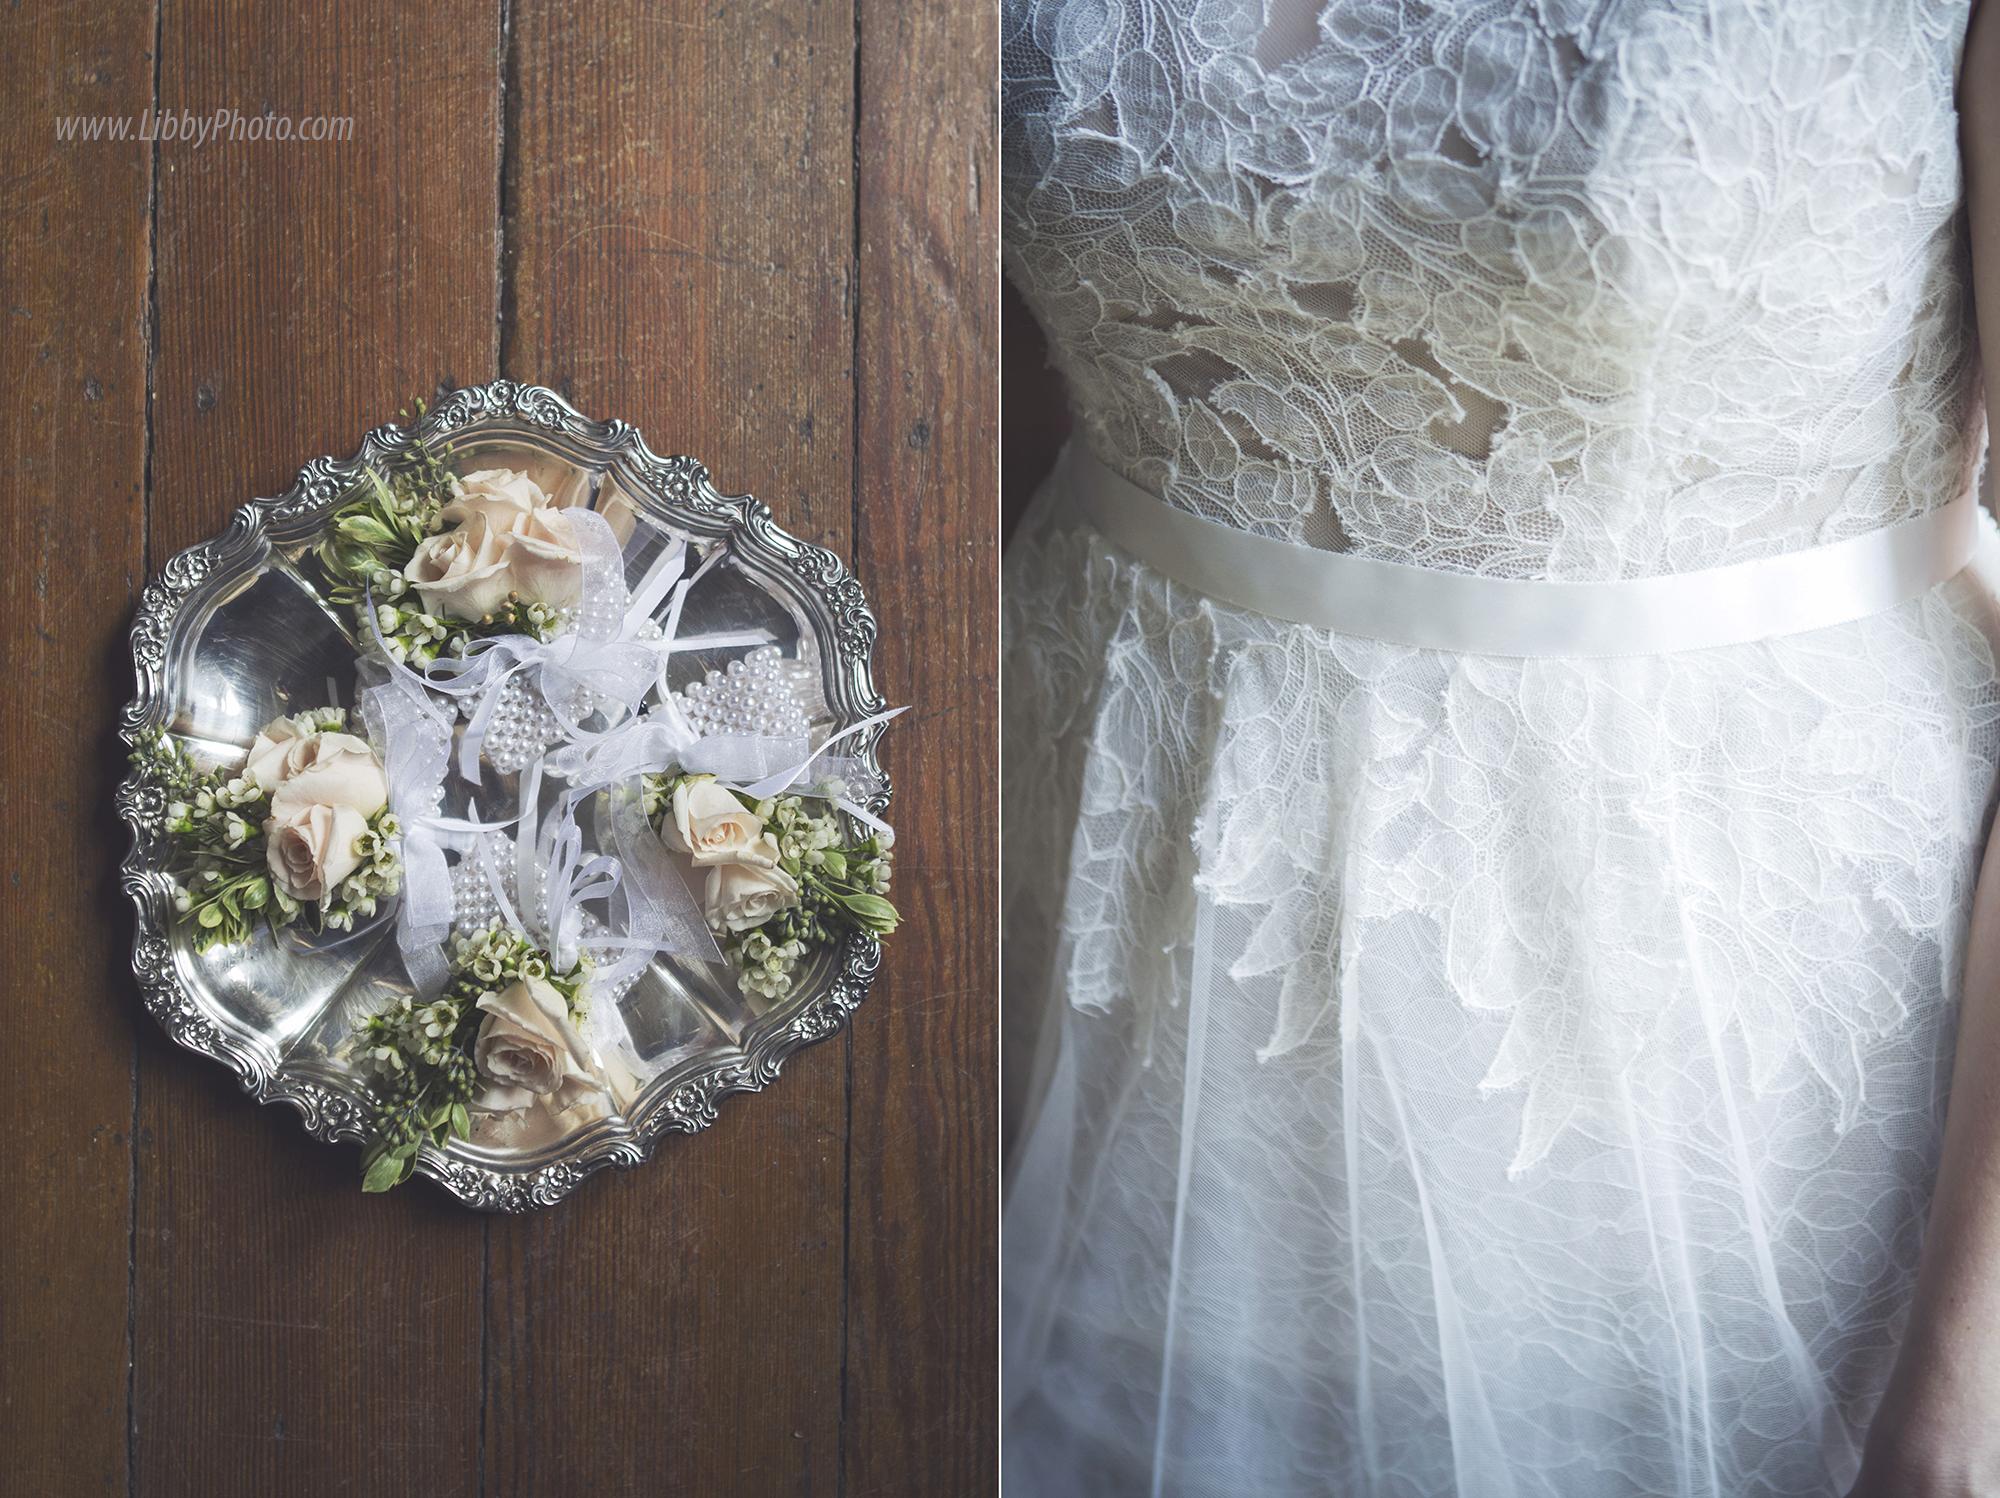 Atlanta wedding photography Libbyphoto (53).jpg